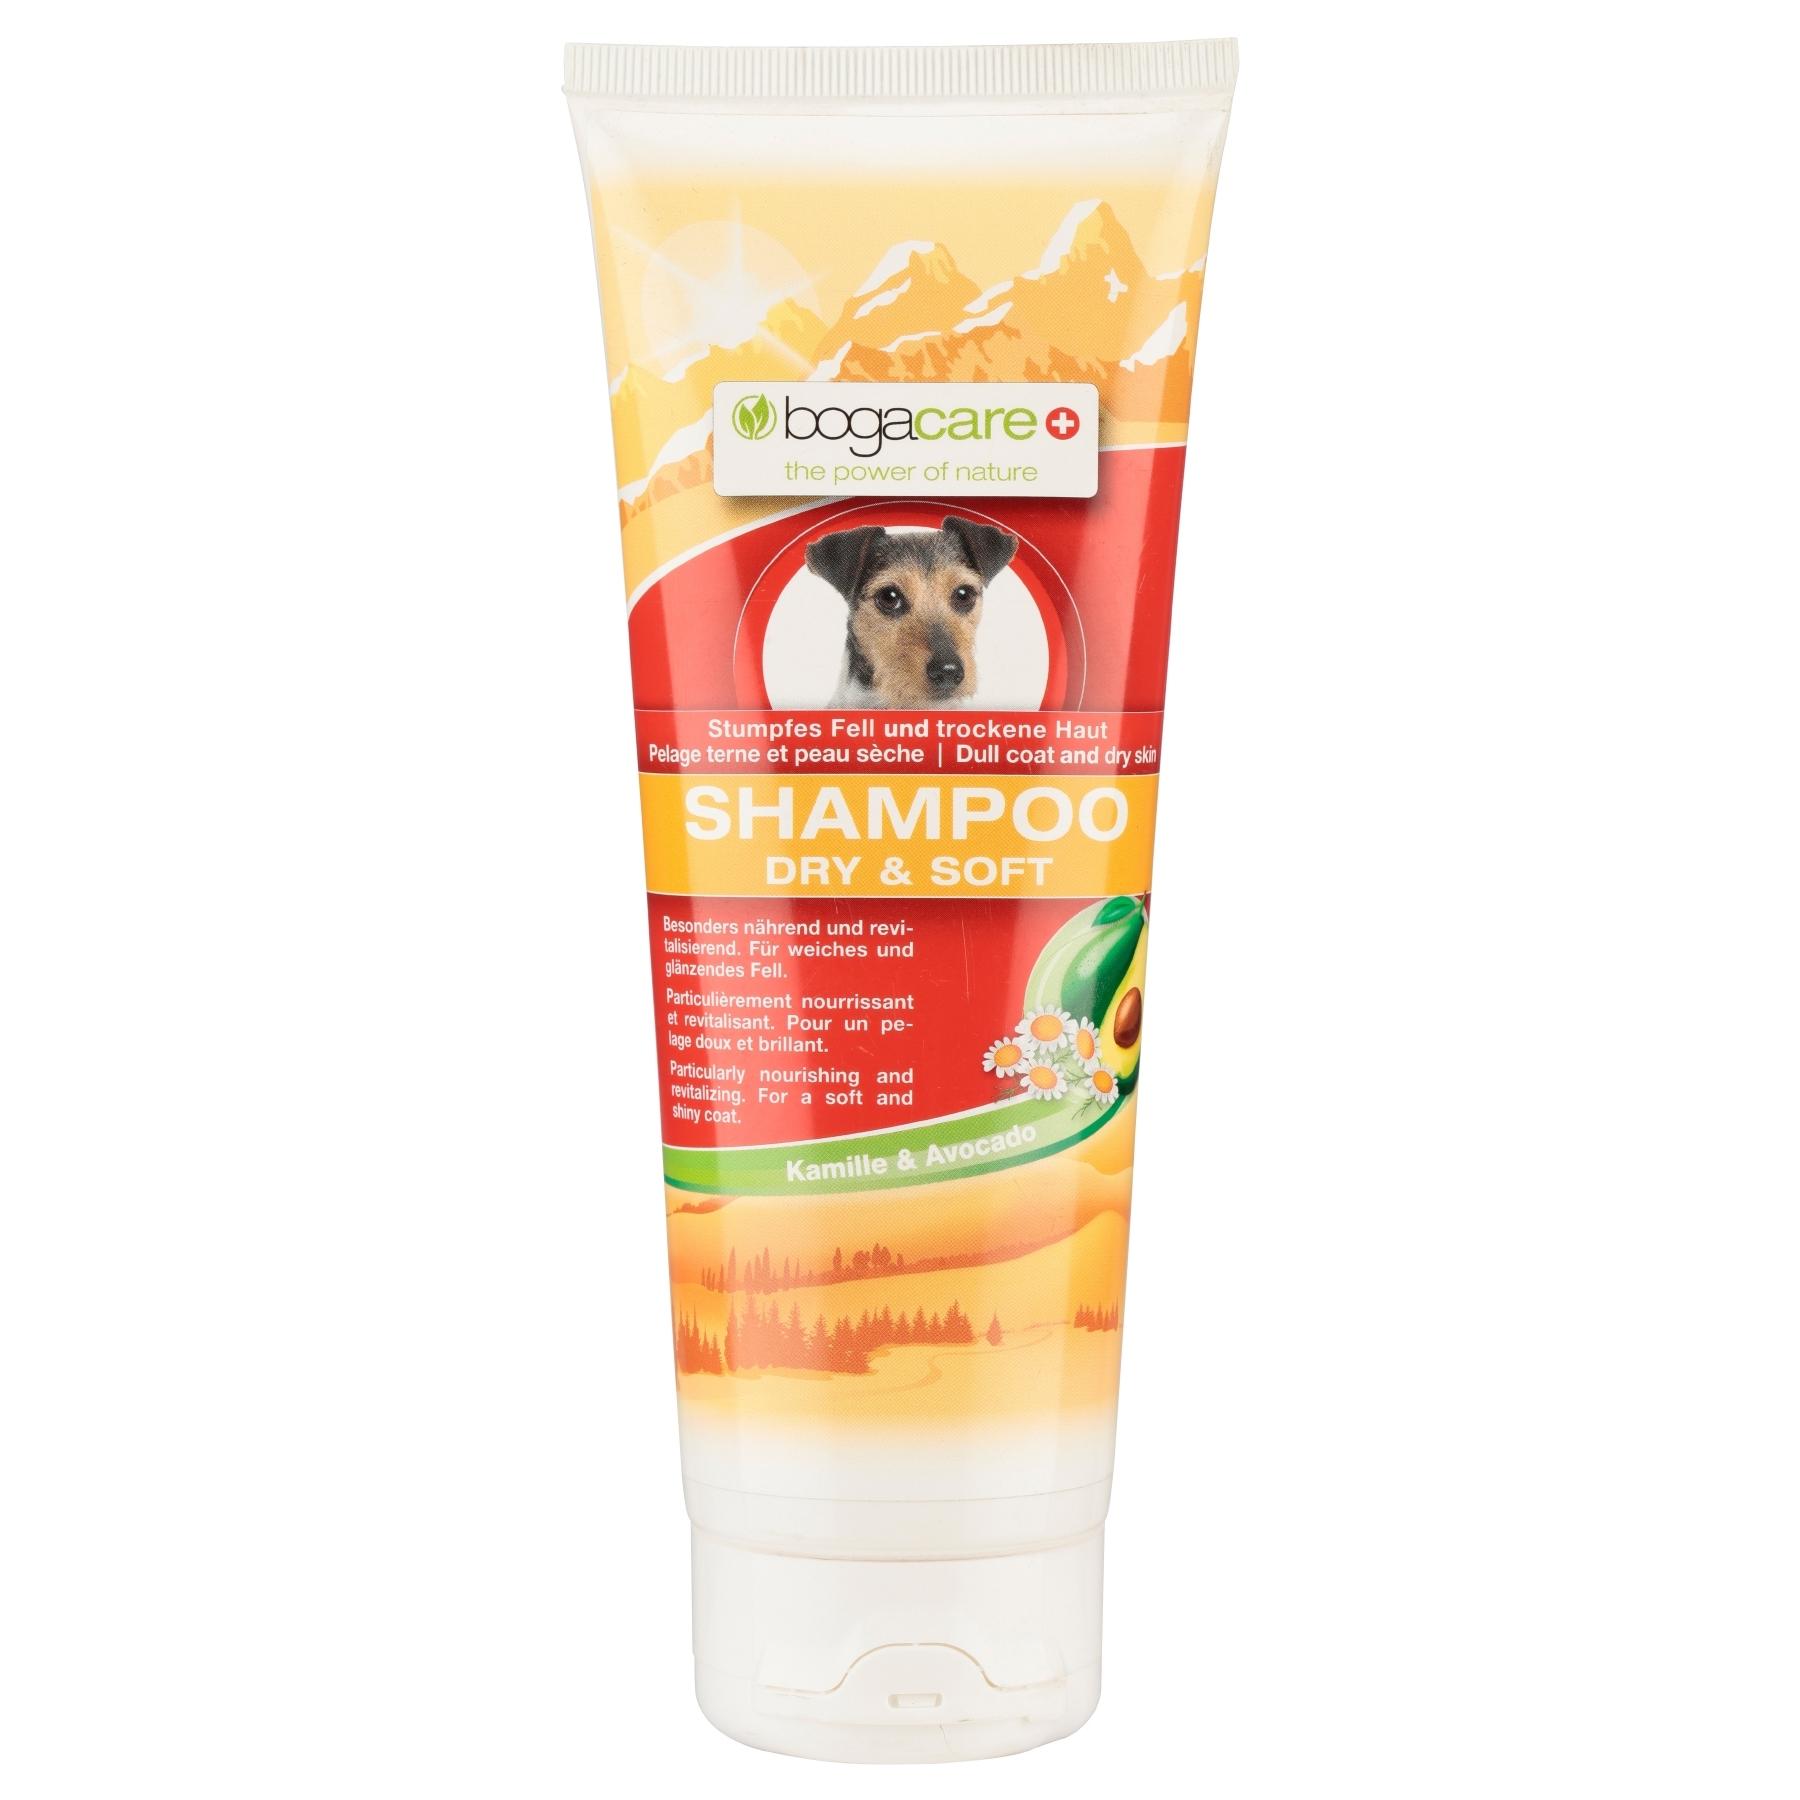 Bogacare Shampoo 200ml